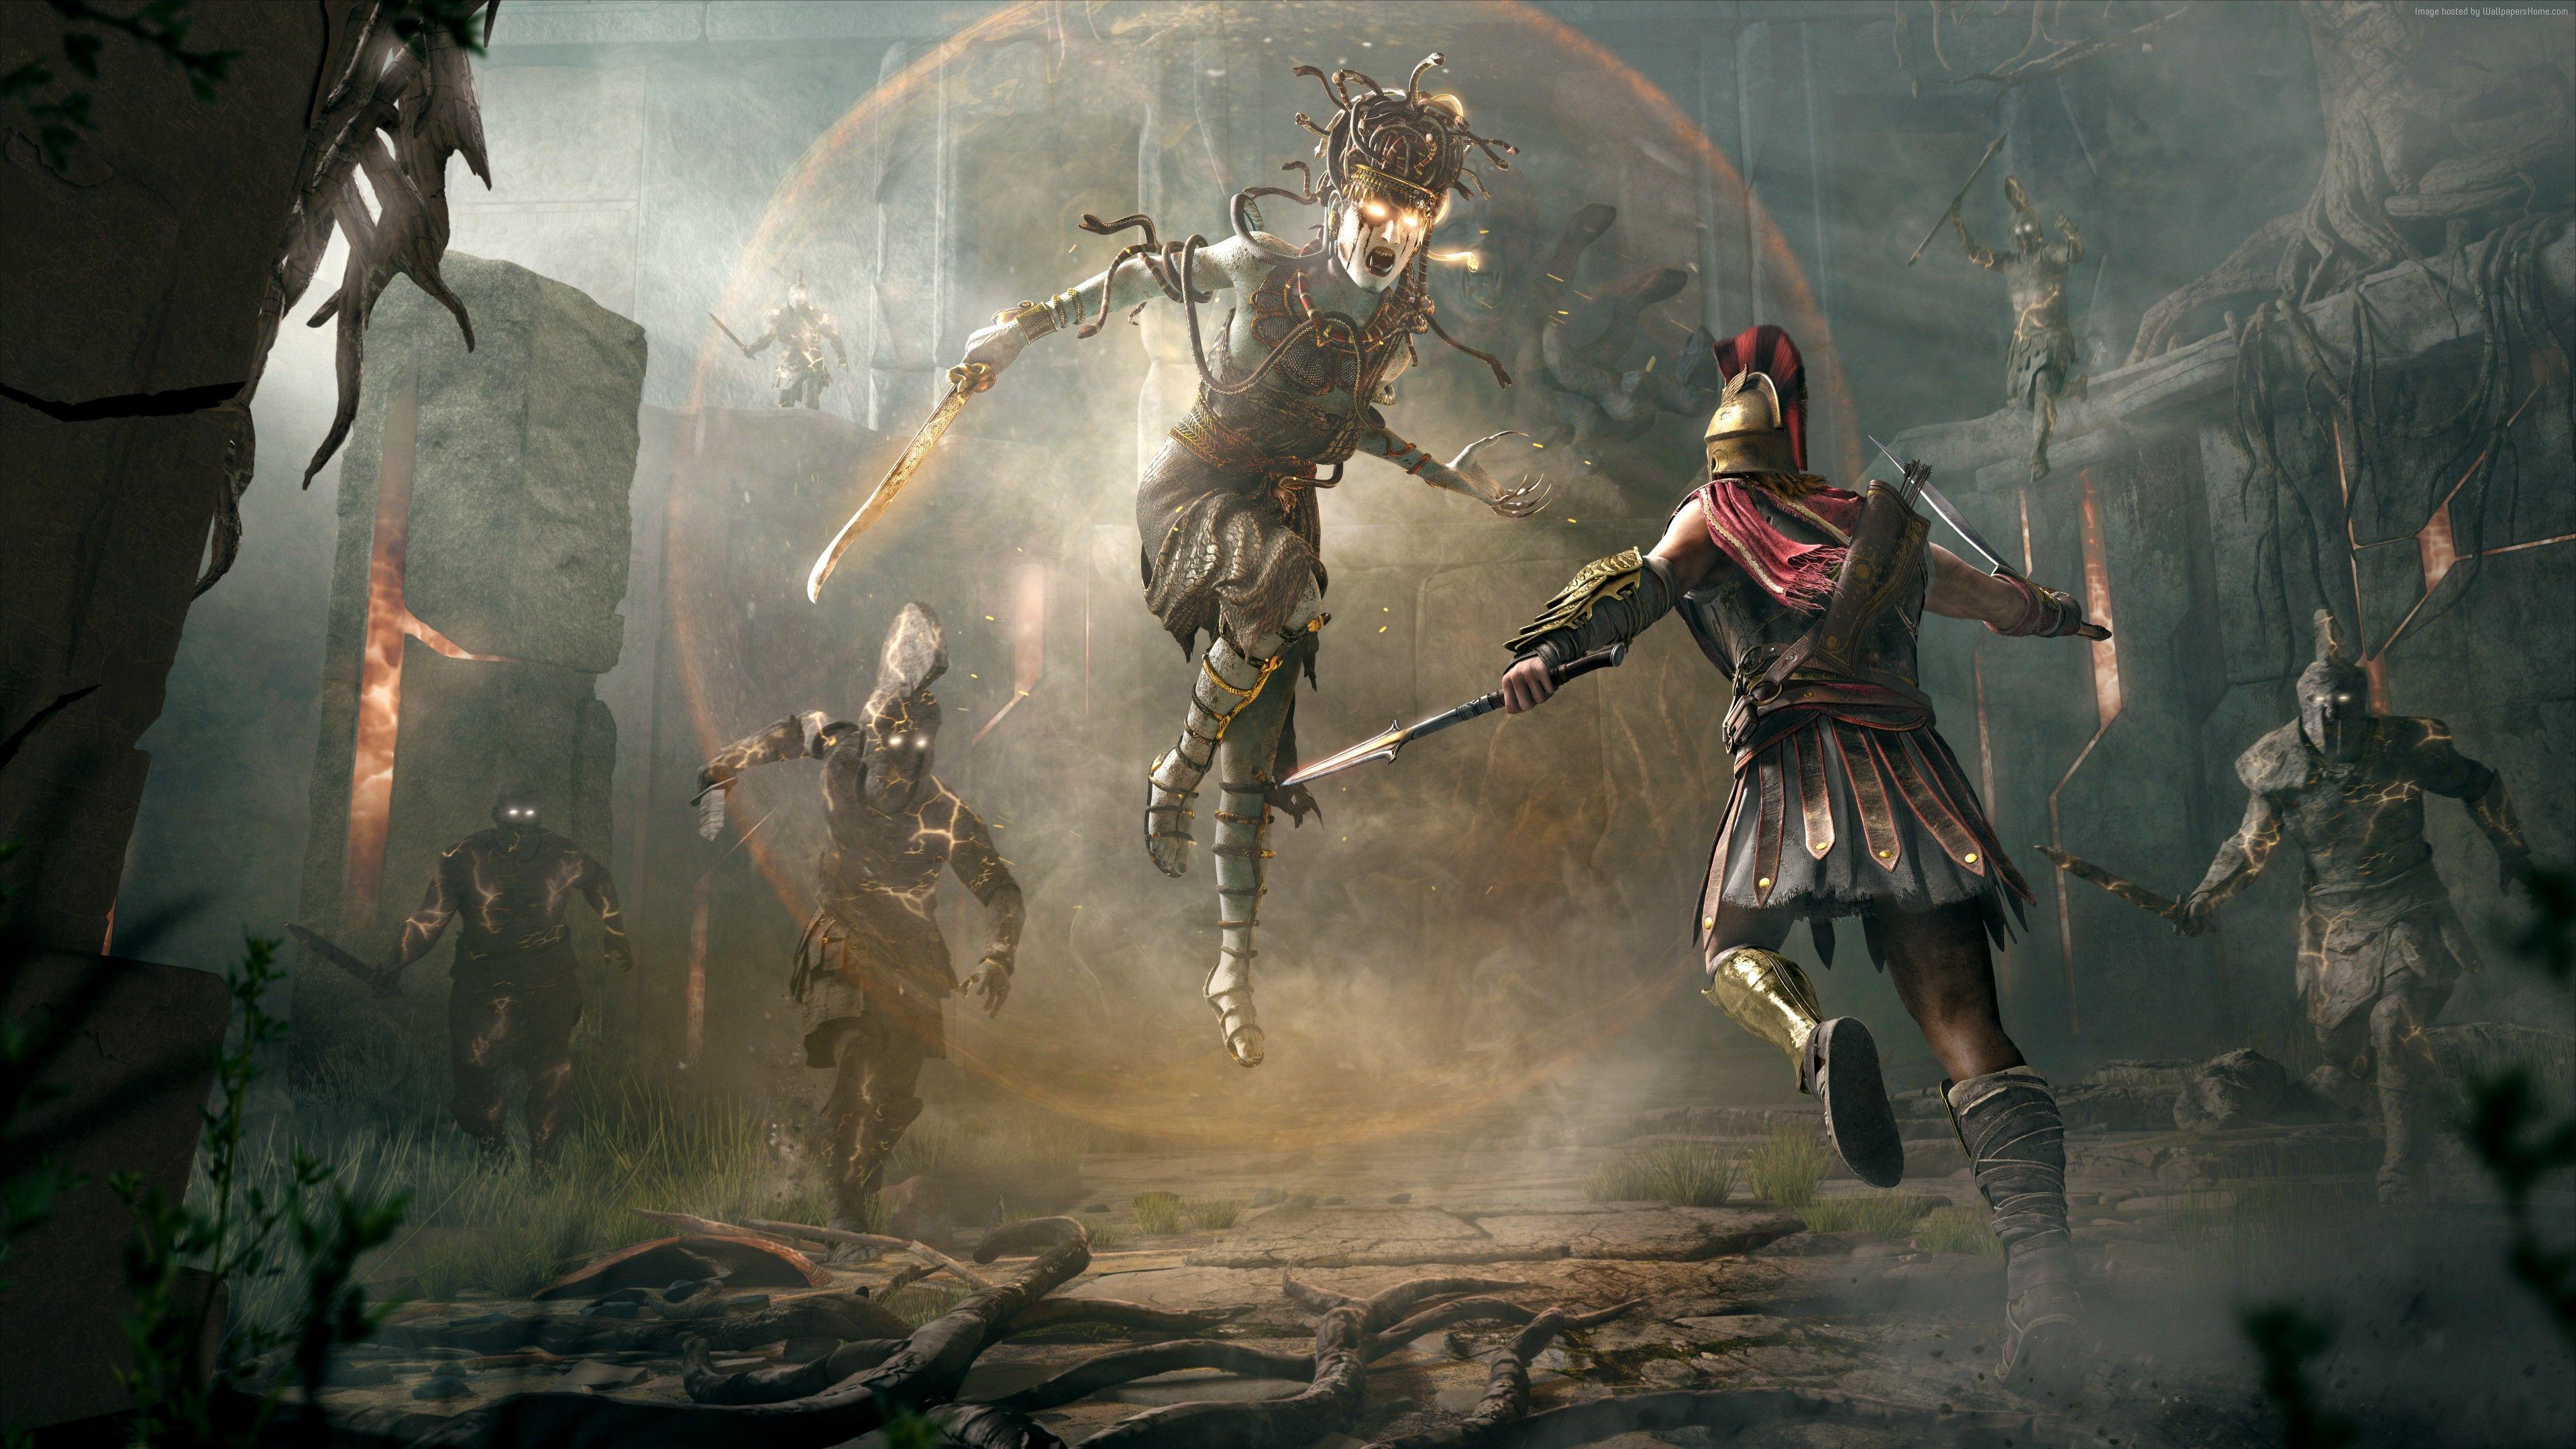 Wallpaper Assassin Http Www Pxwall Com Wallpaper Assassin 7 Assassin S Creed Wallpaper Assassins Creed Assassins Creed Odyssey